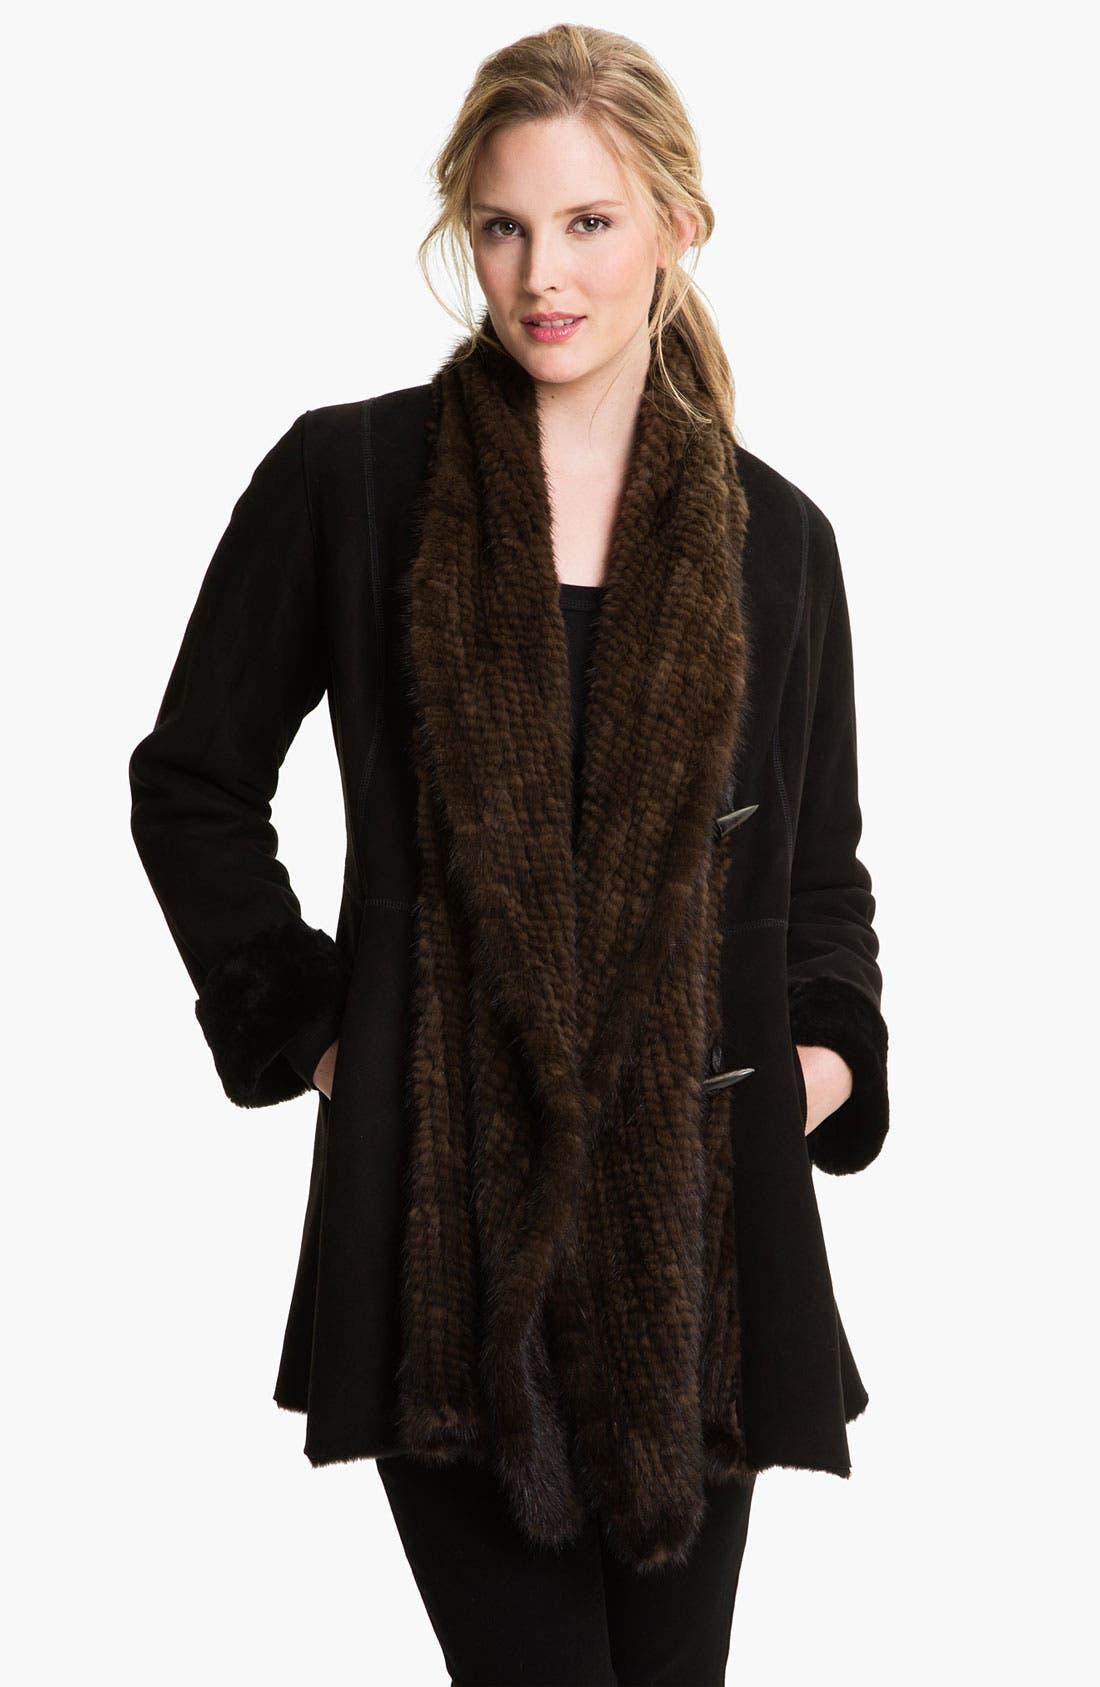 Alternate Image 1 Selected - HIDESOCIETY Genuine Shearling Coat with Genuine Mink Trim